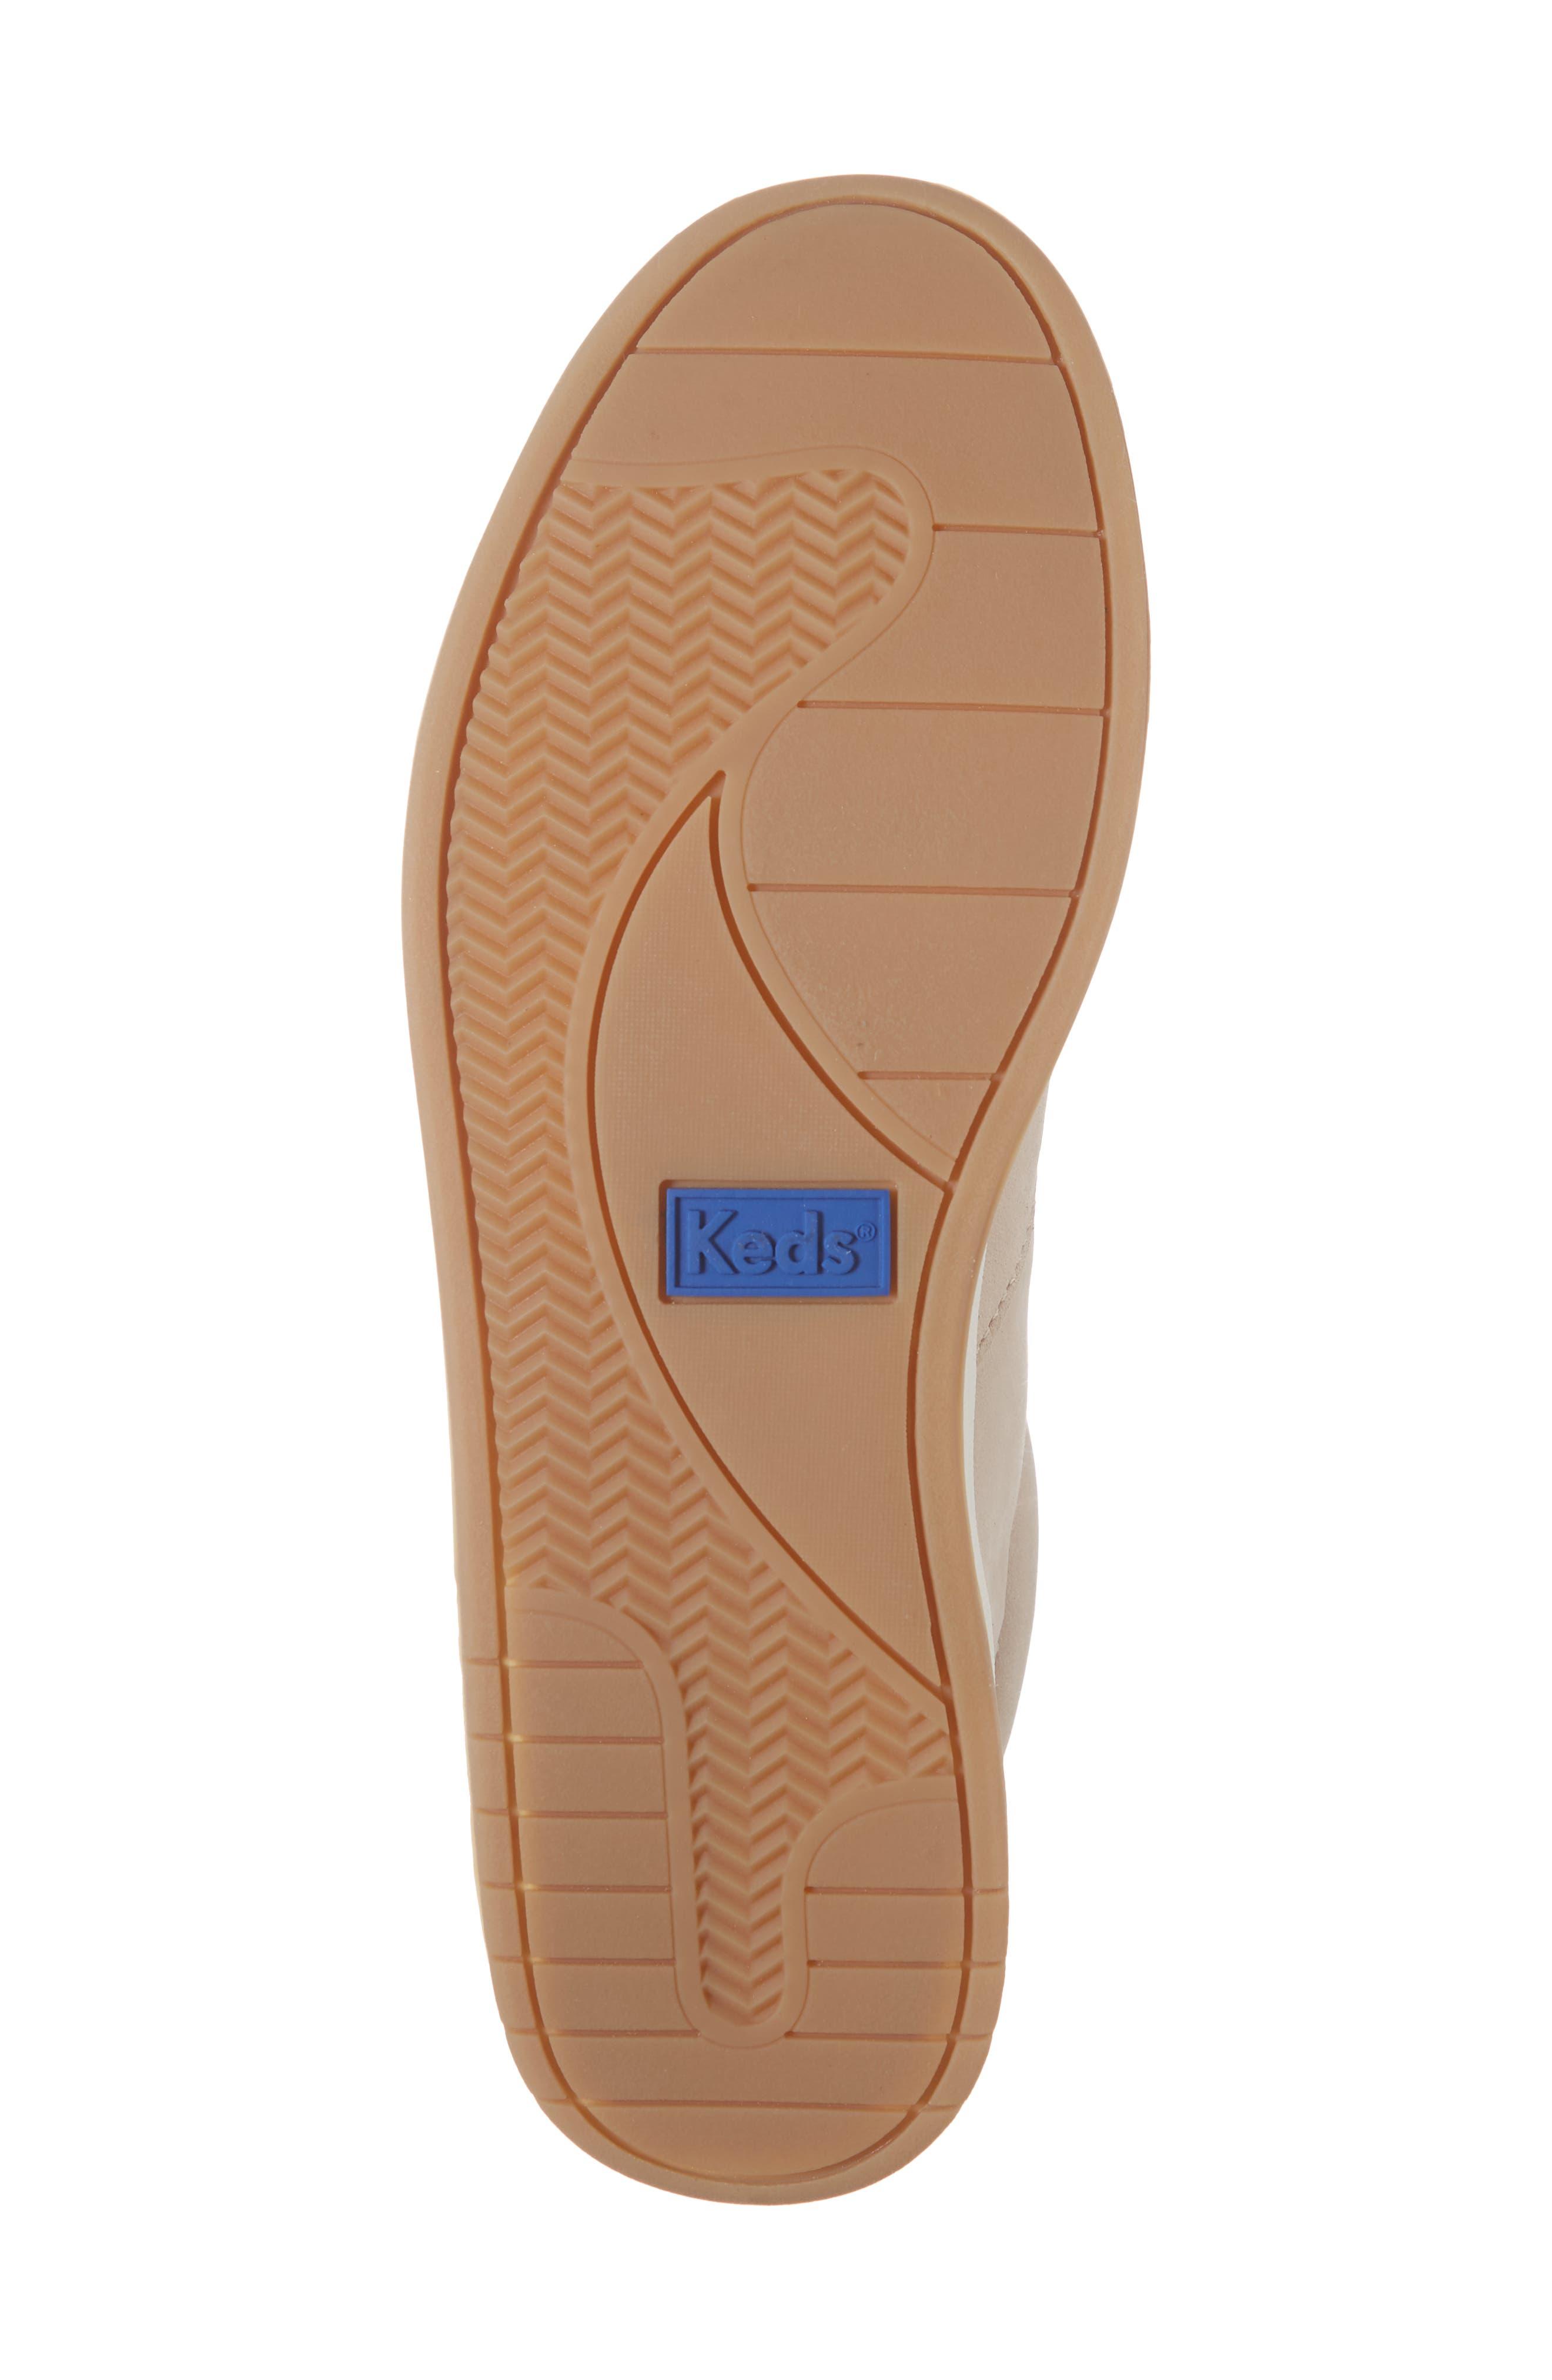 Match Point Sneaker,                             Alternate thumbnail 6, color,                             685